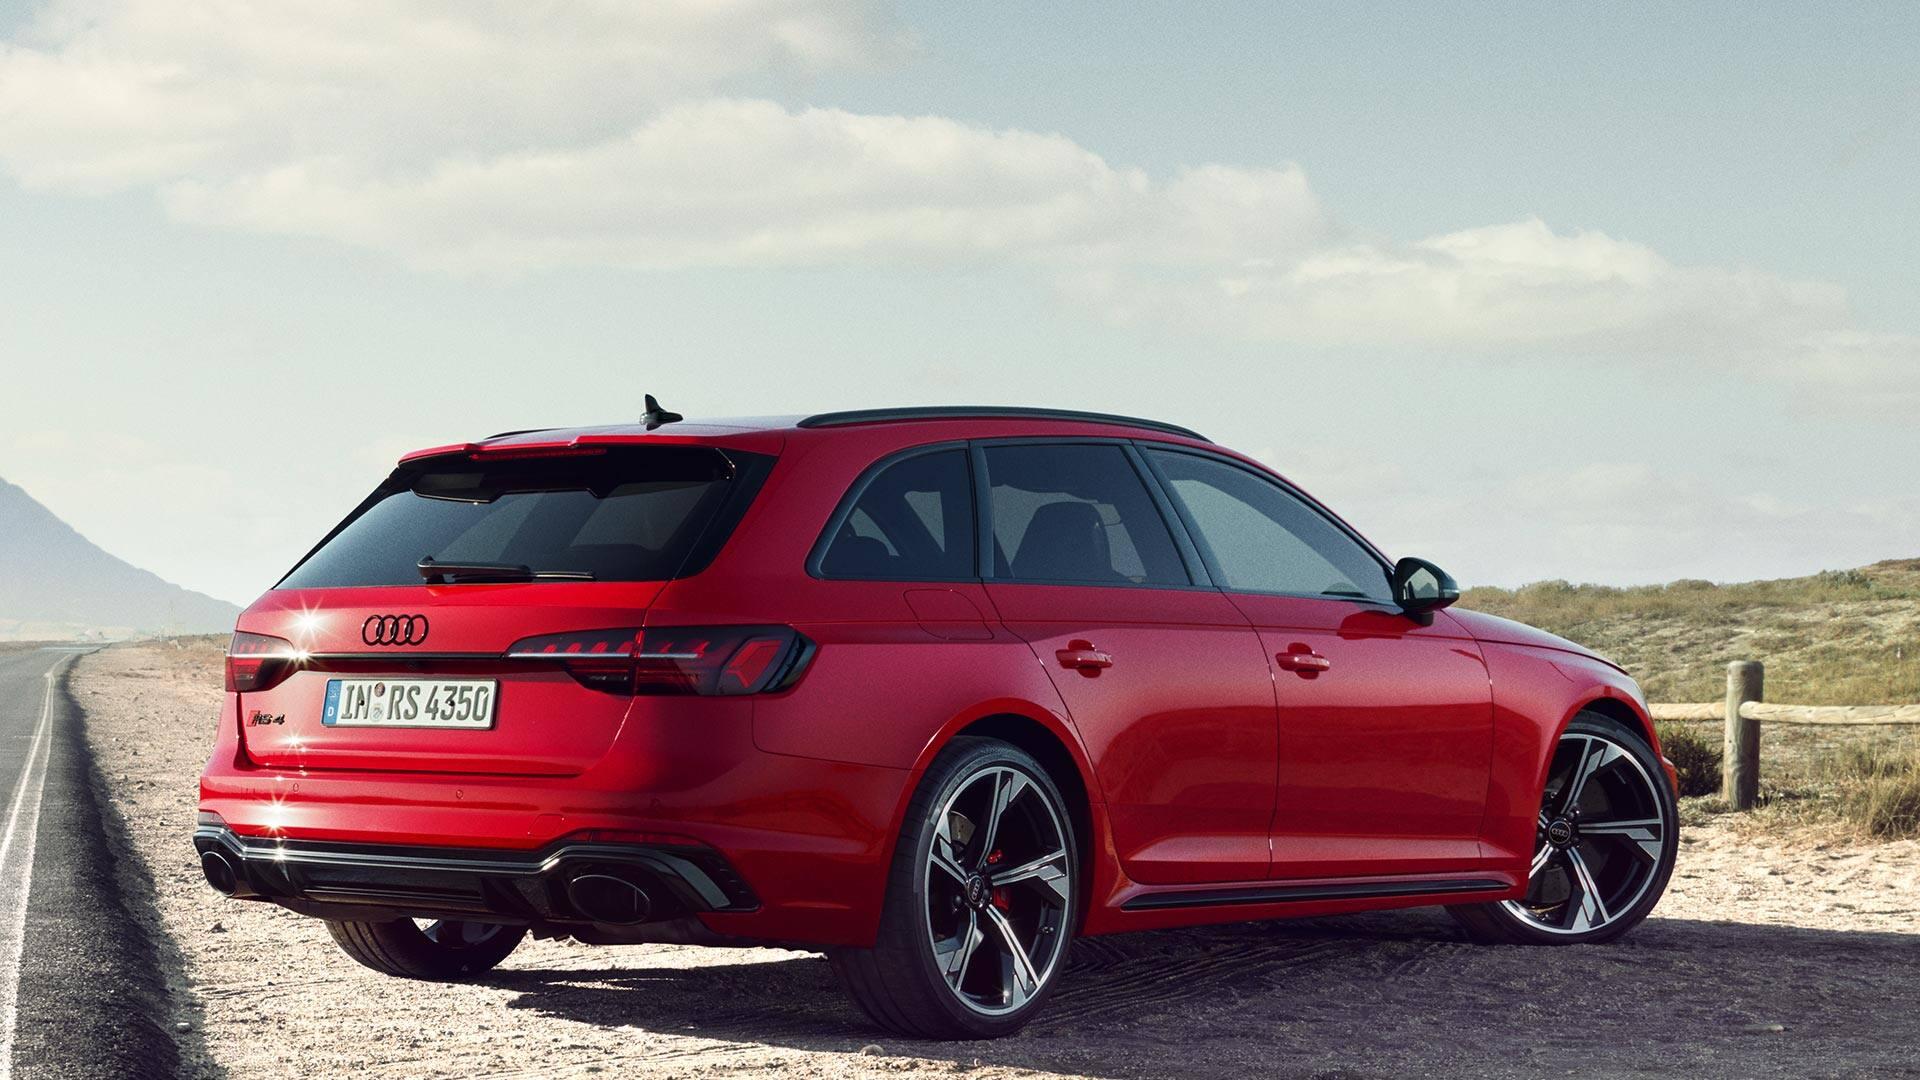 Rear view Audi RS 4 Avant